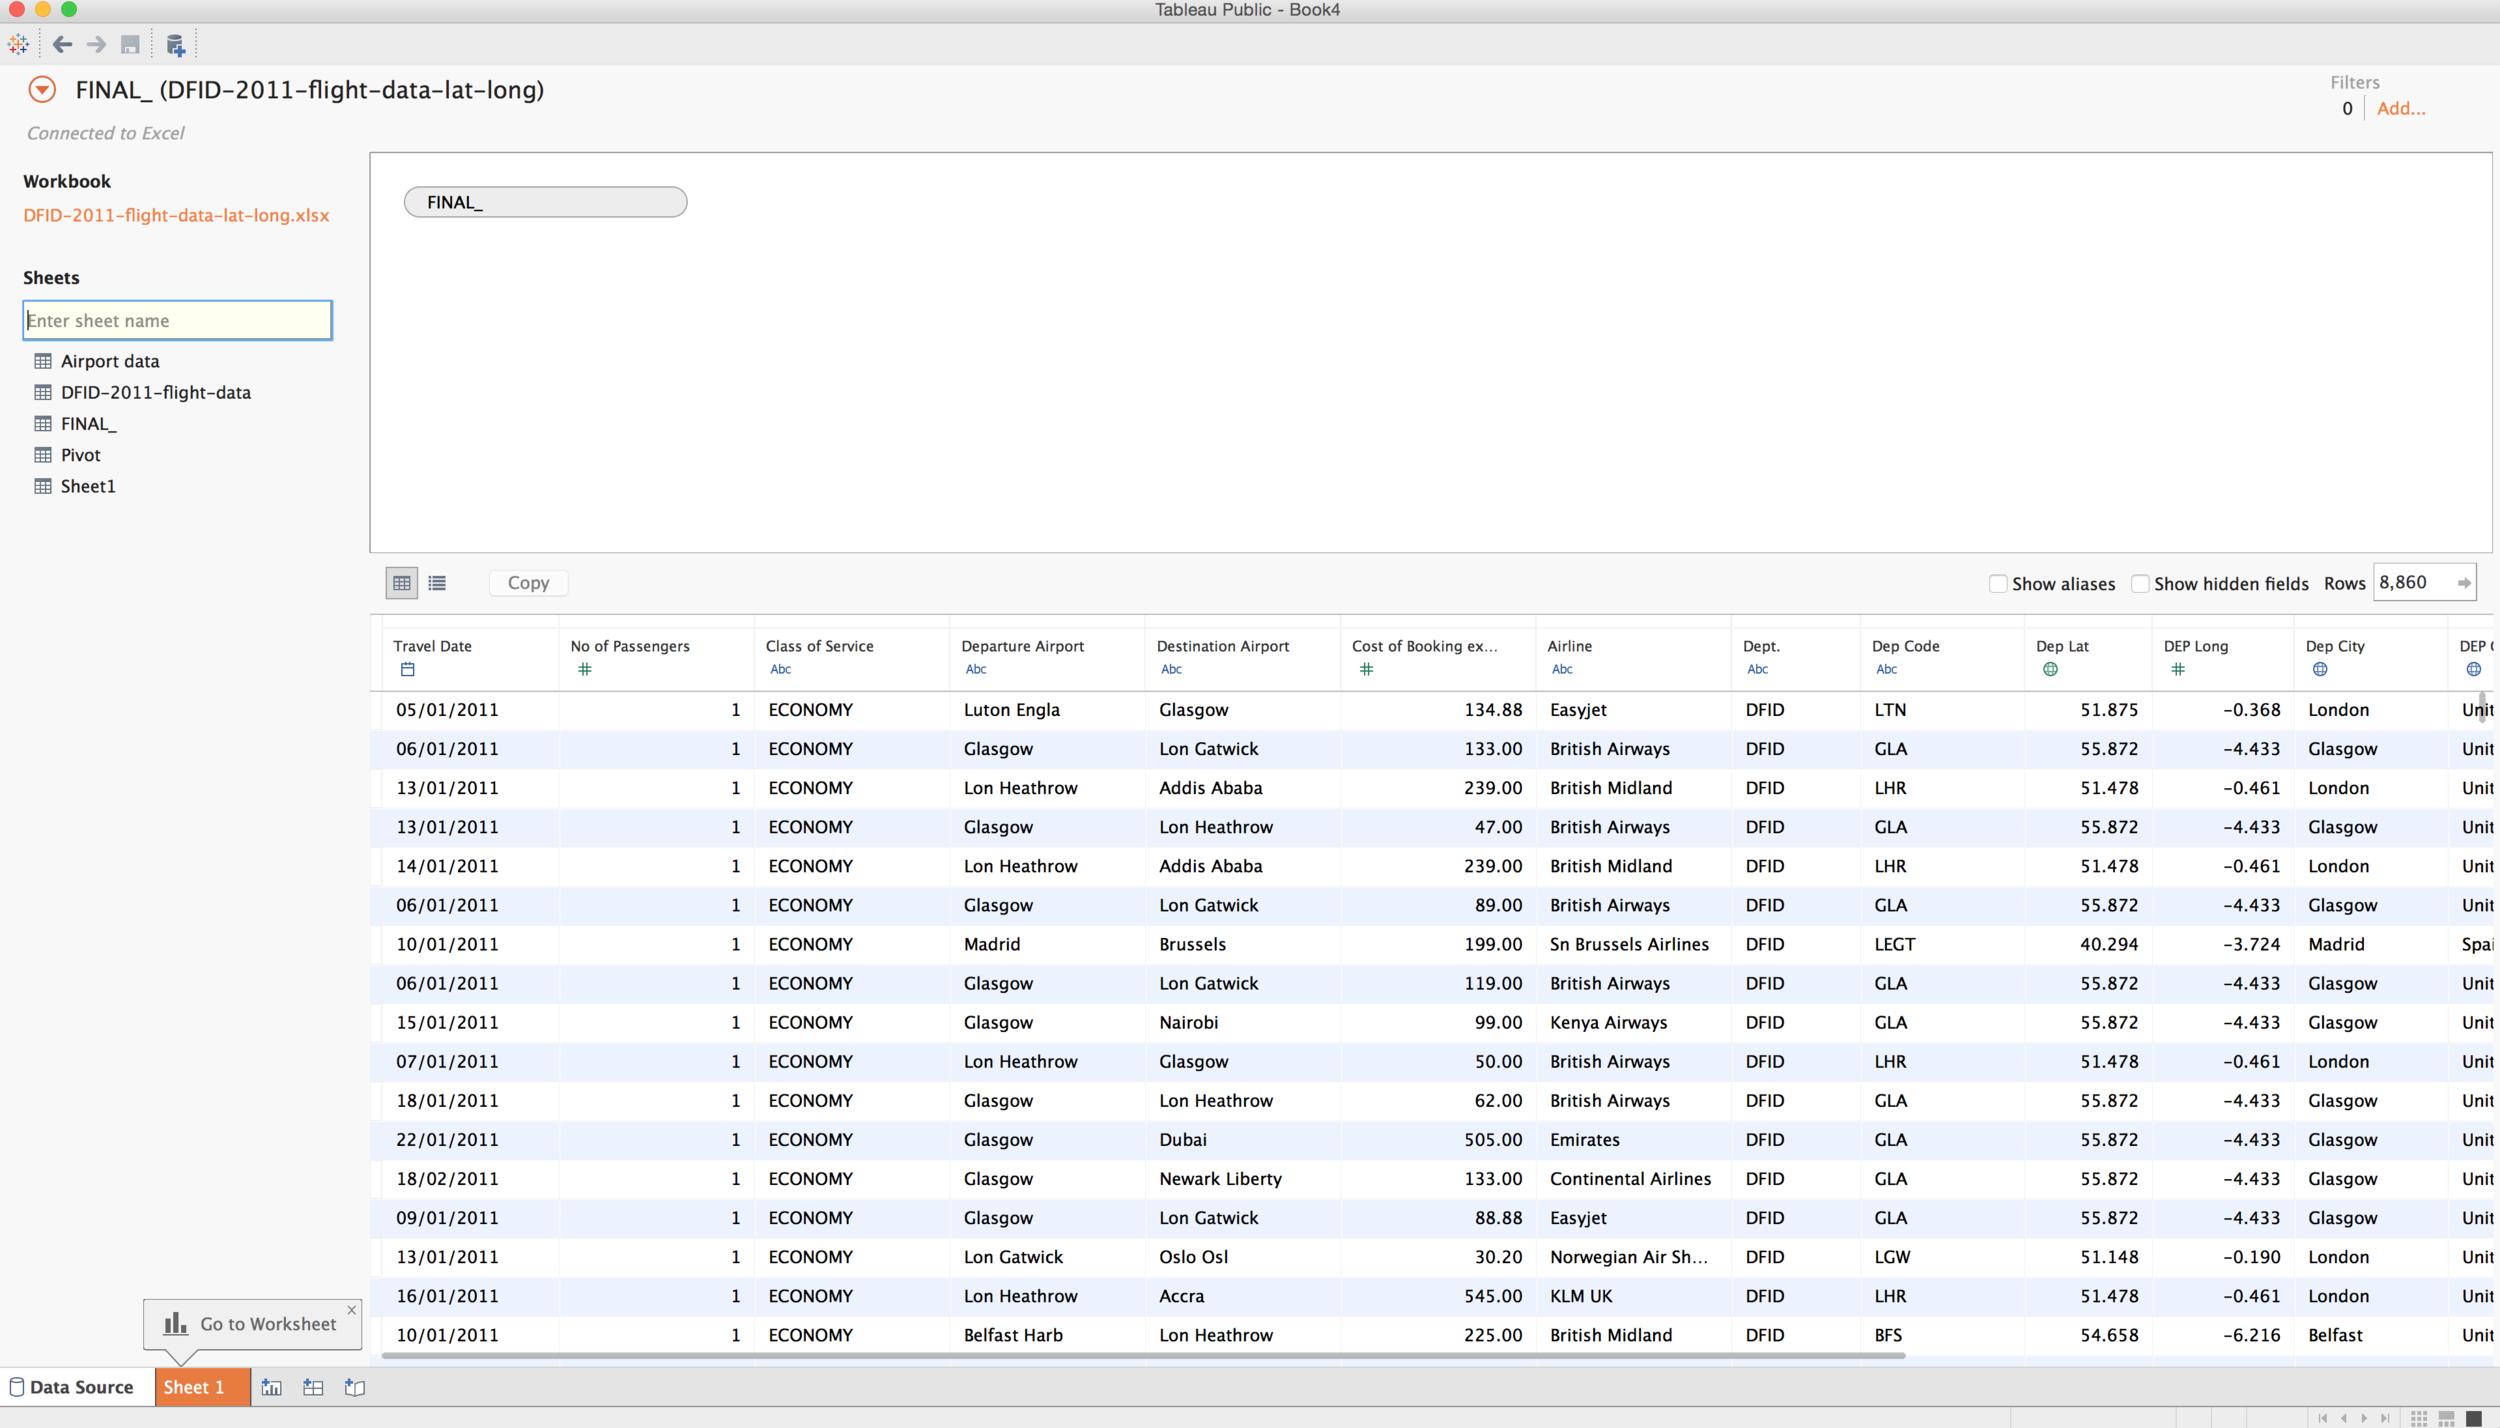 Screenshot 2015-04-12 16.50.34.png